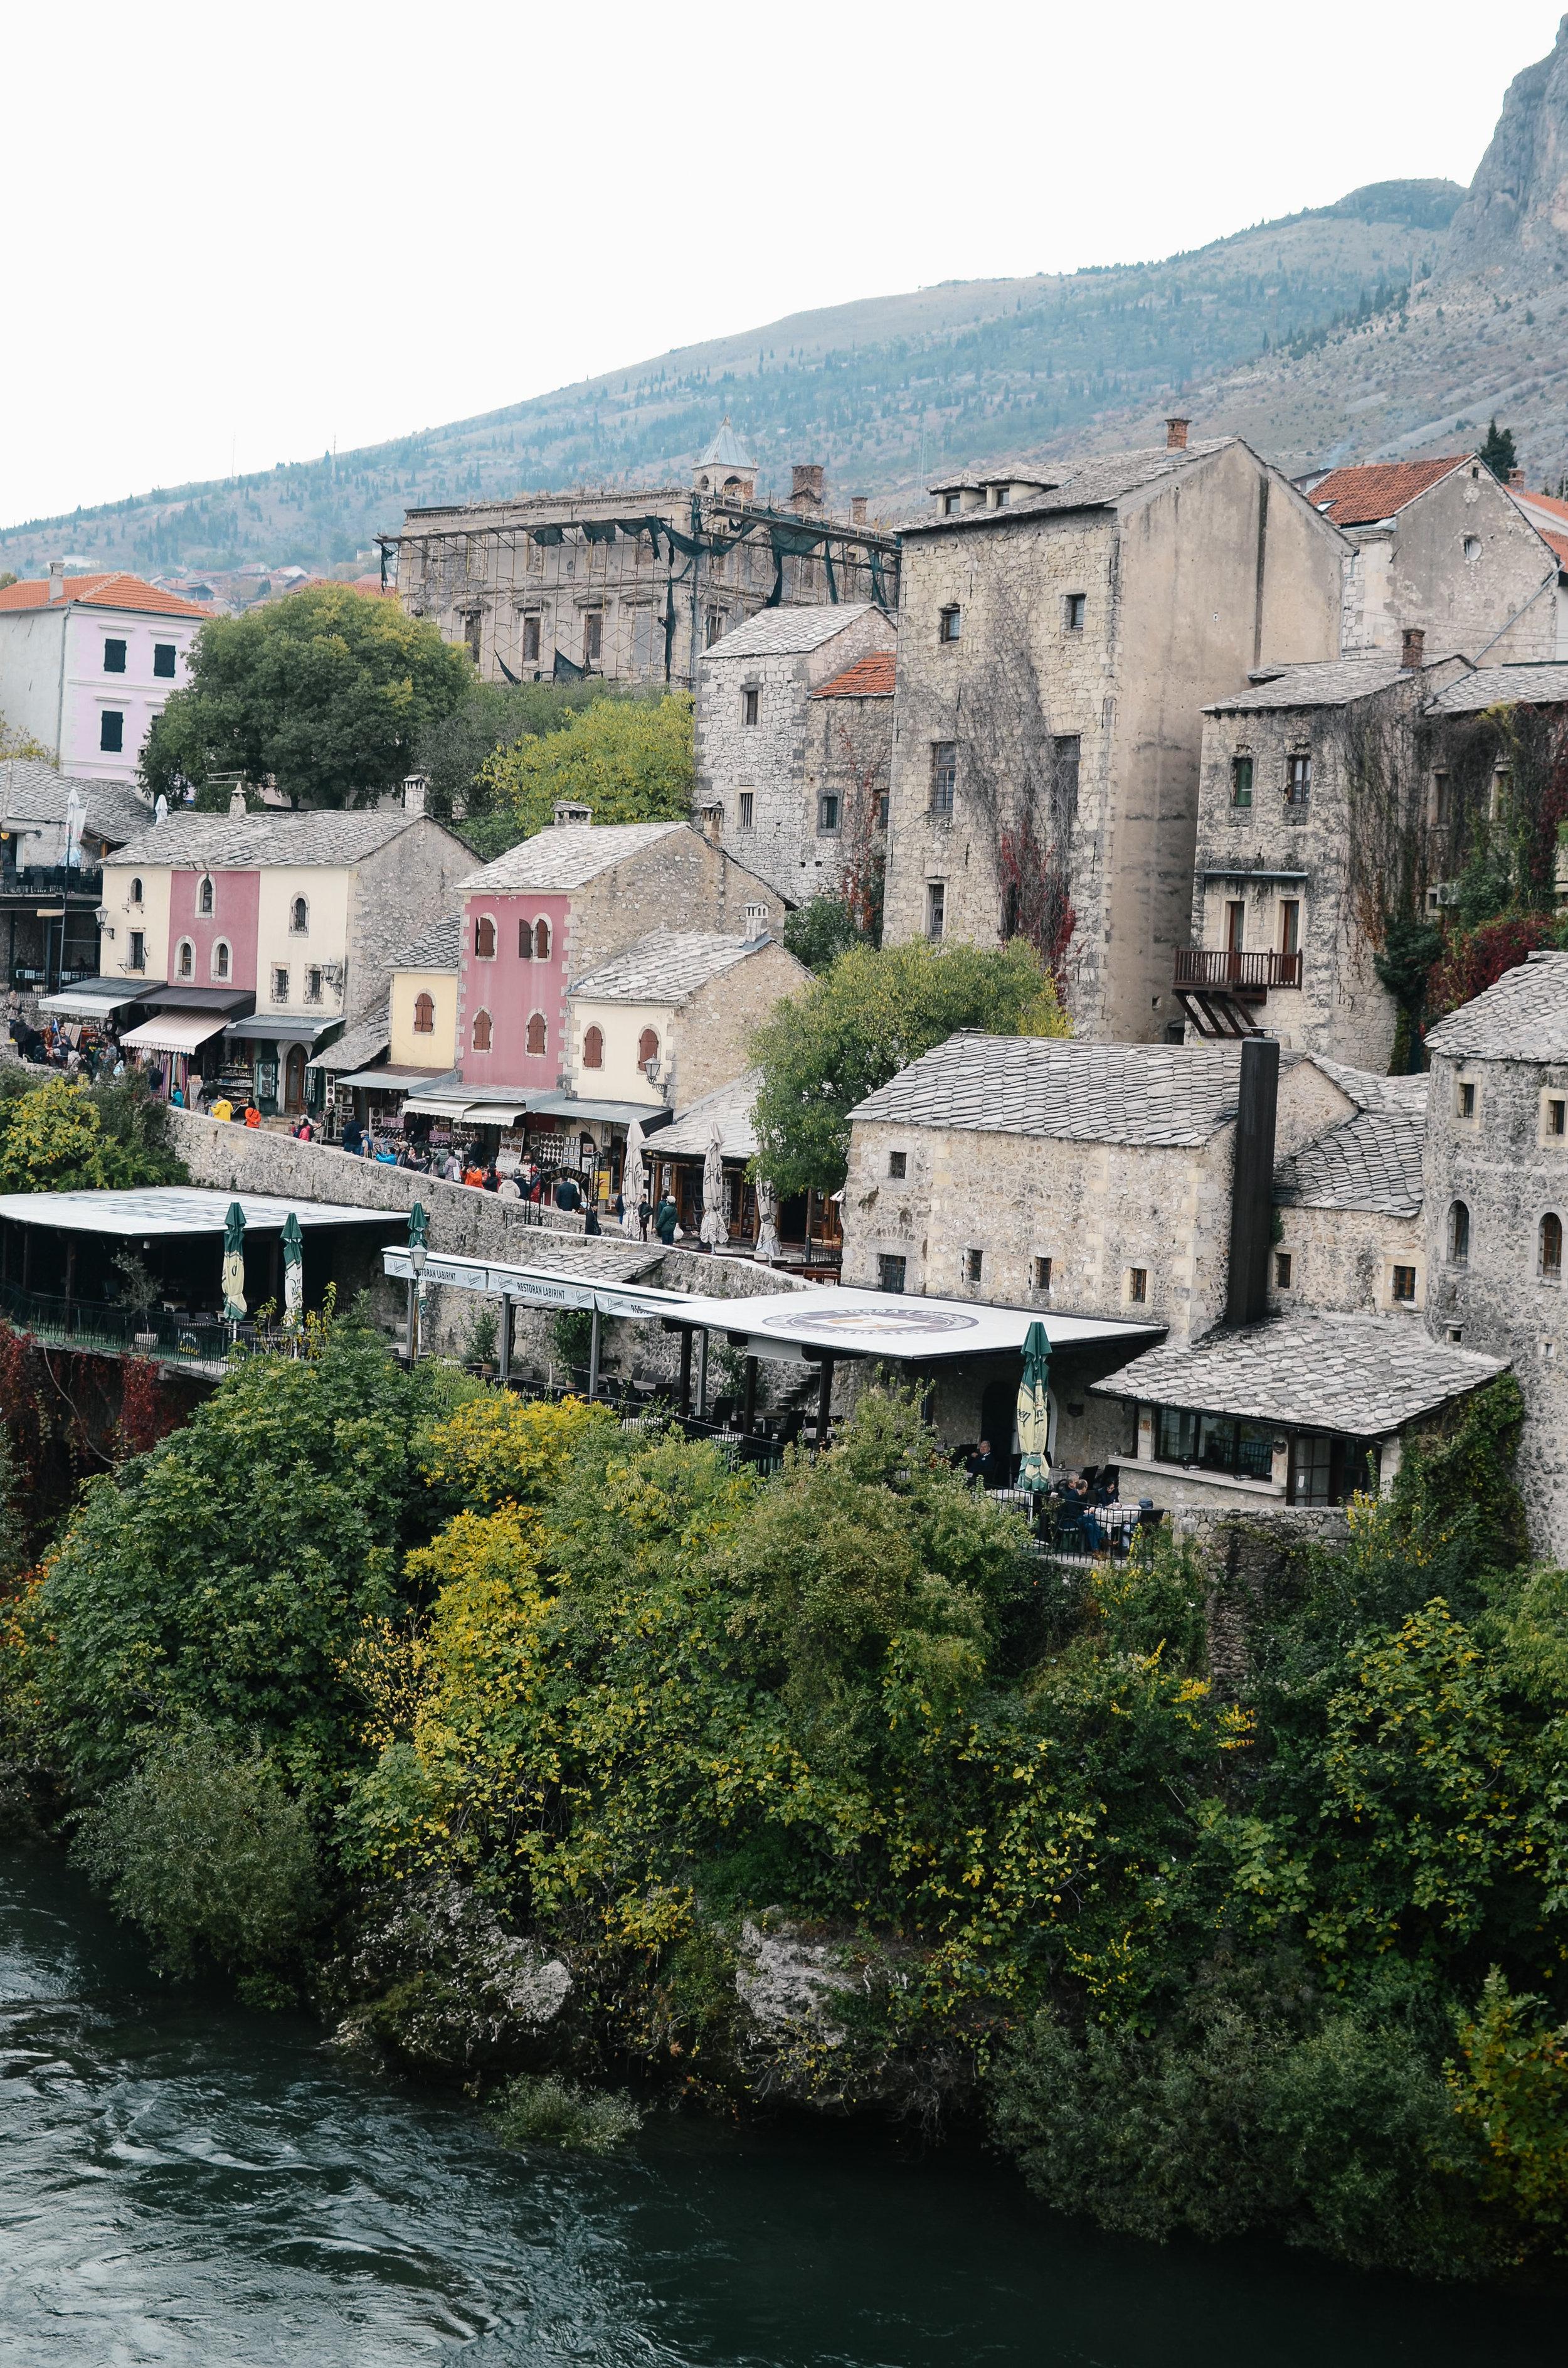 mostar-bosnia-travel-guide-lifeonpine_DSC_3159.jpg